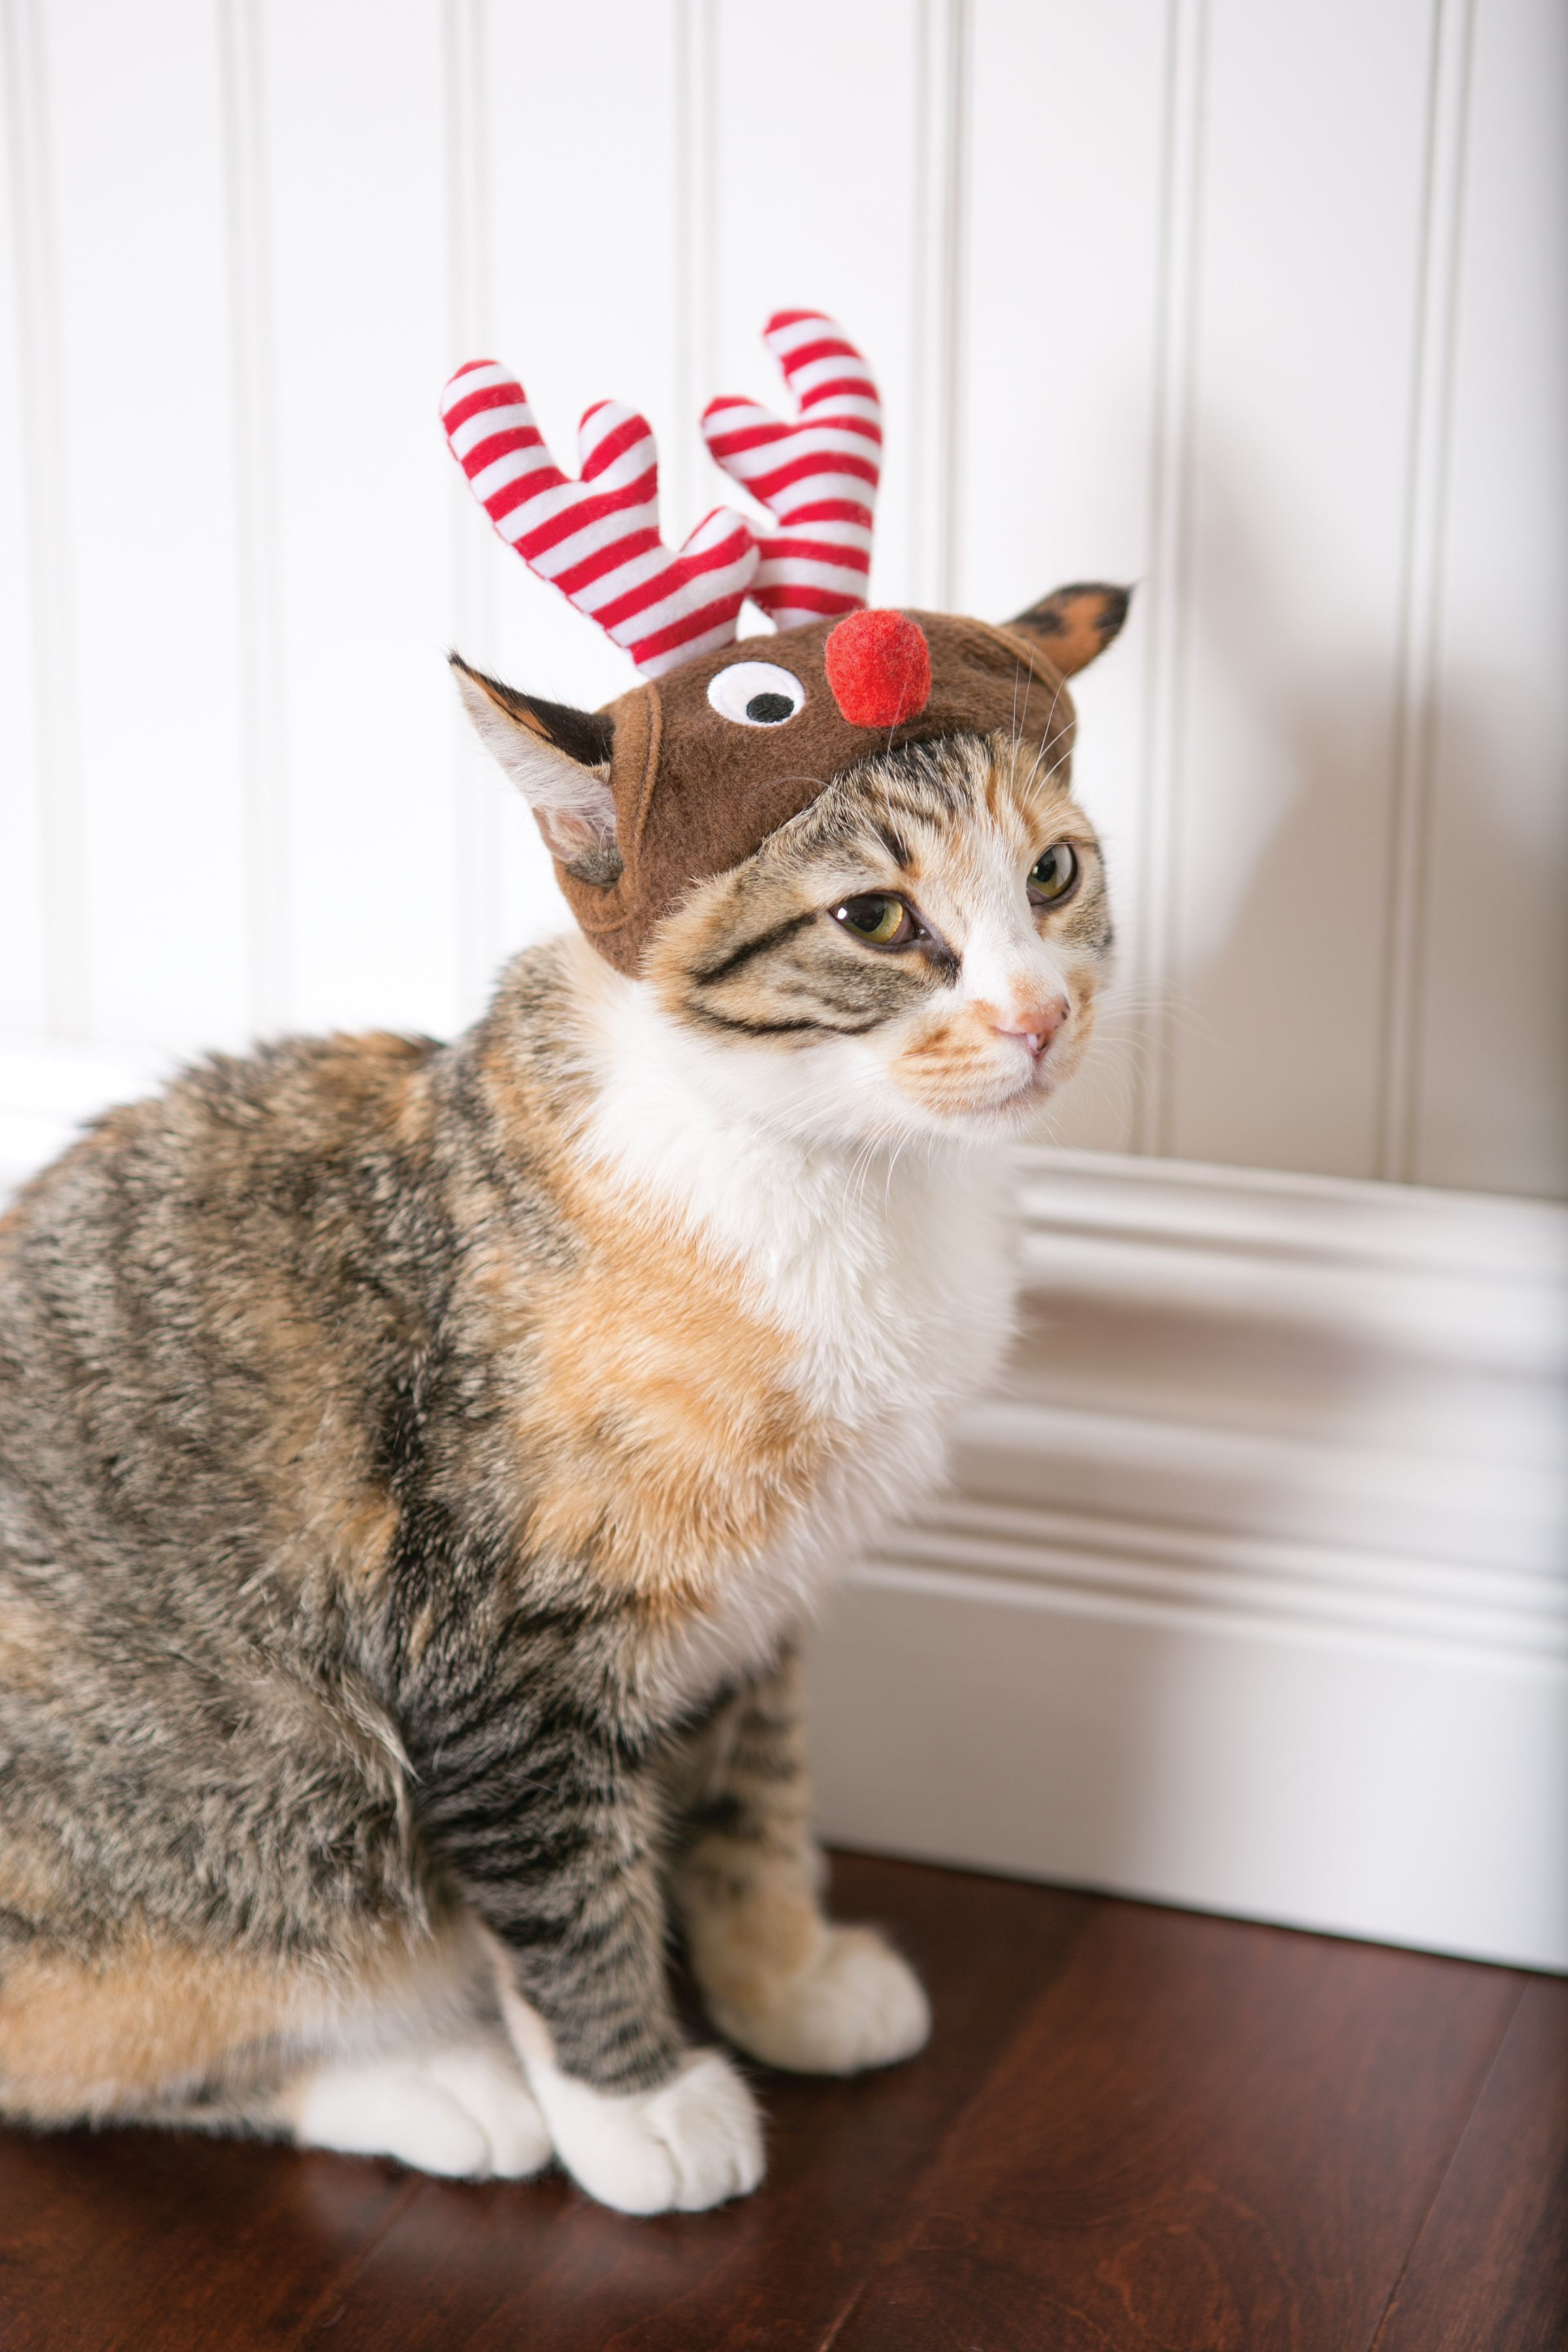 Pin by verma wilson on cats in hats pinterest reindeer games